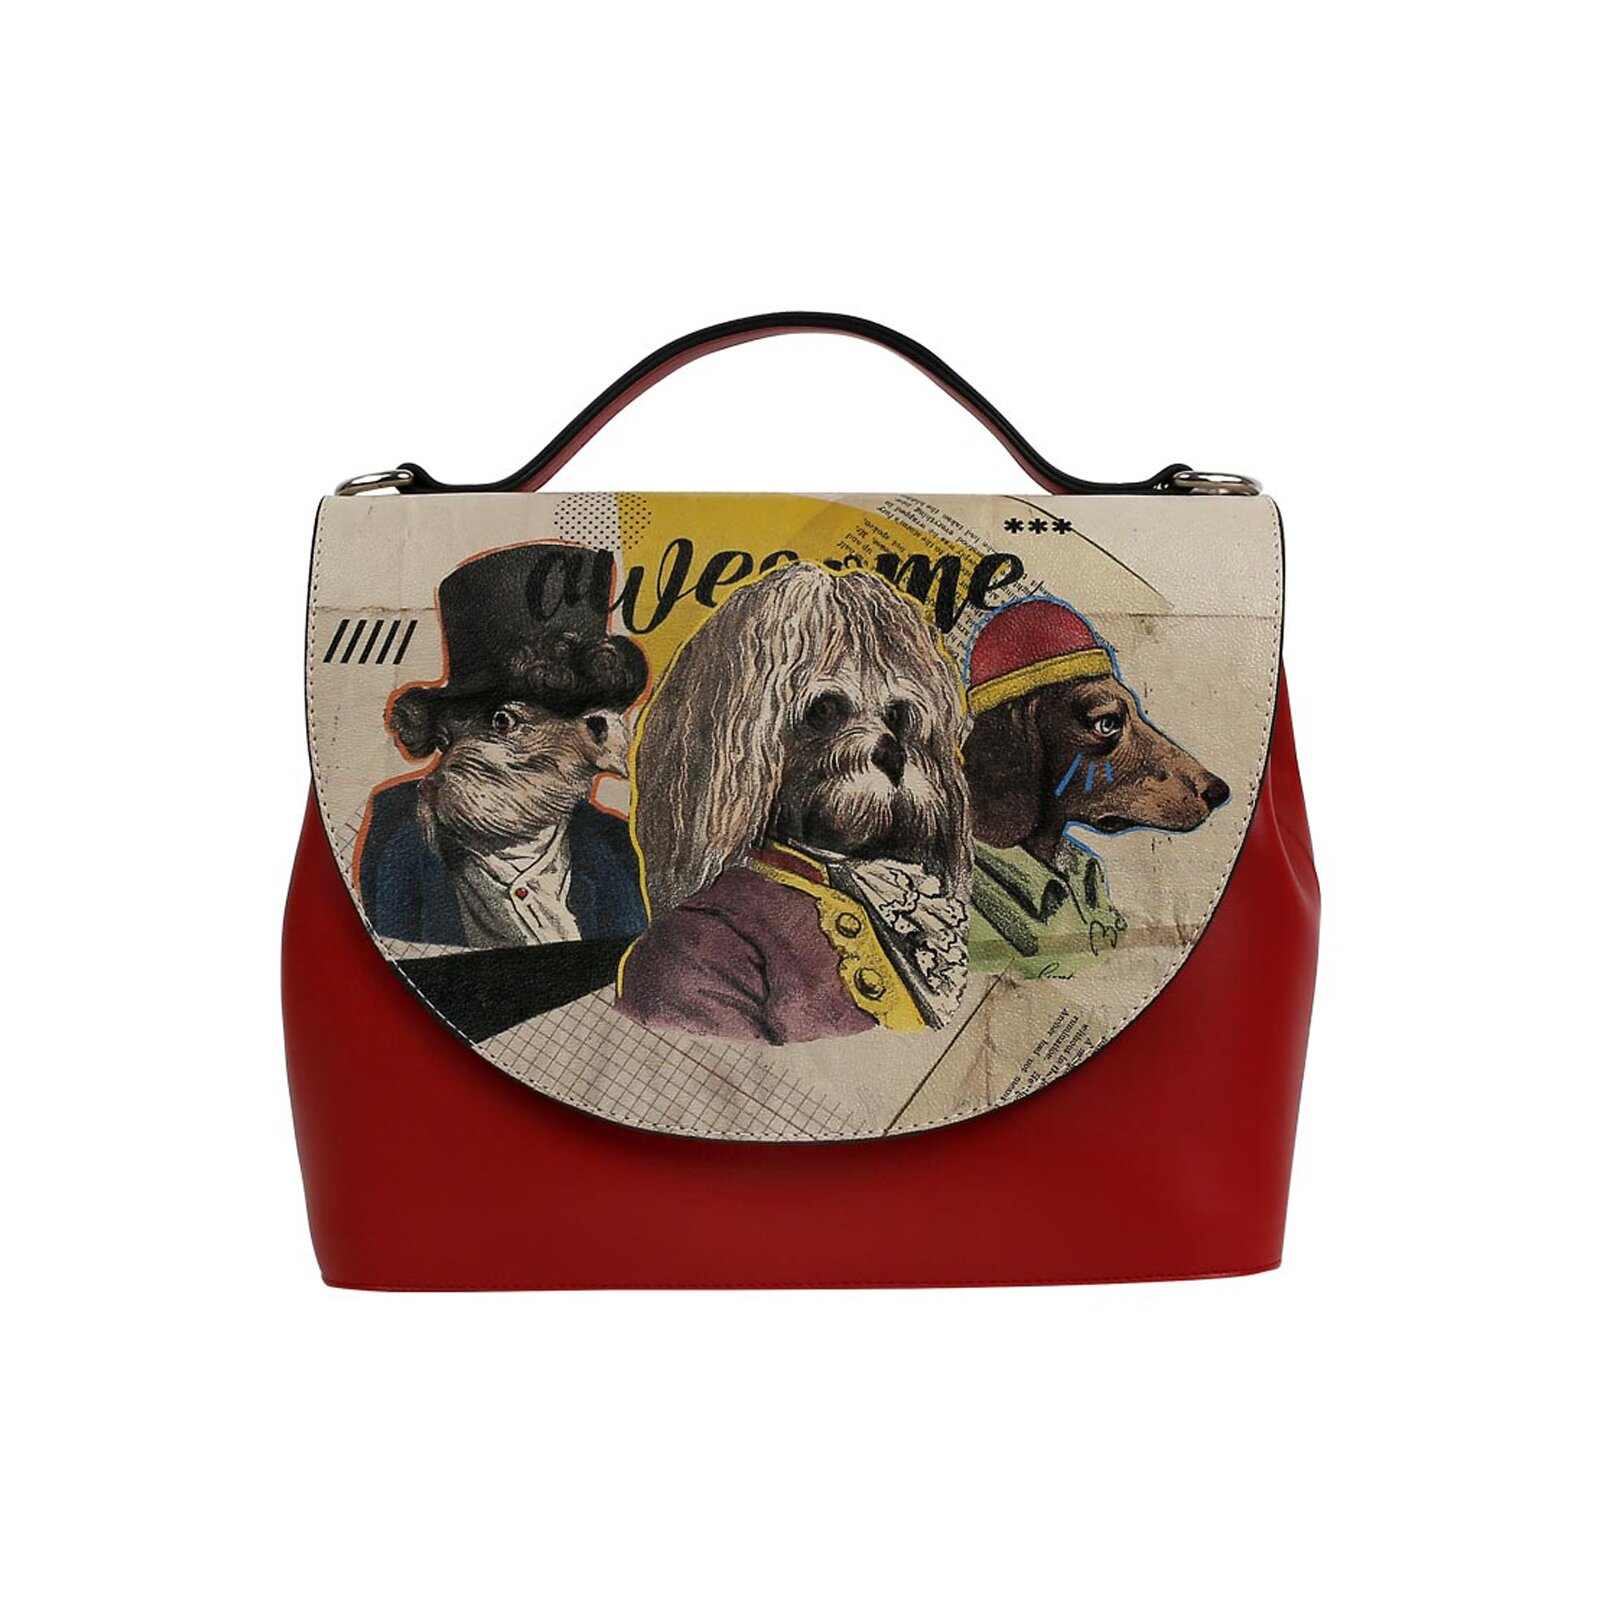 DOGO Handy Bag - Awesome